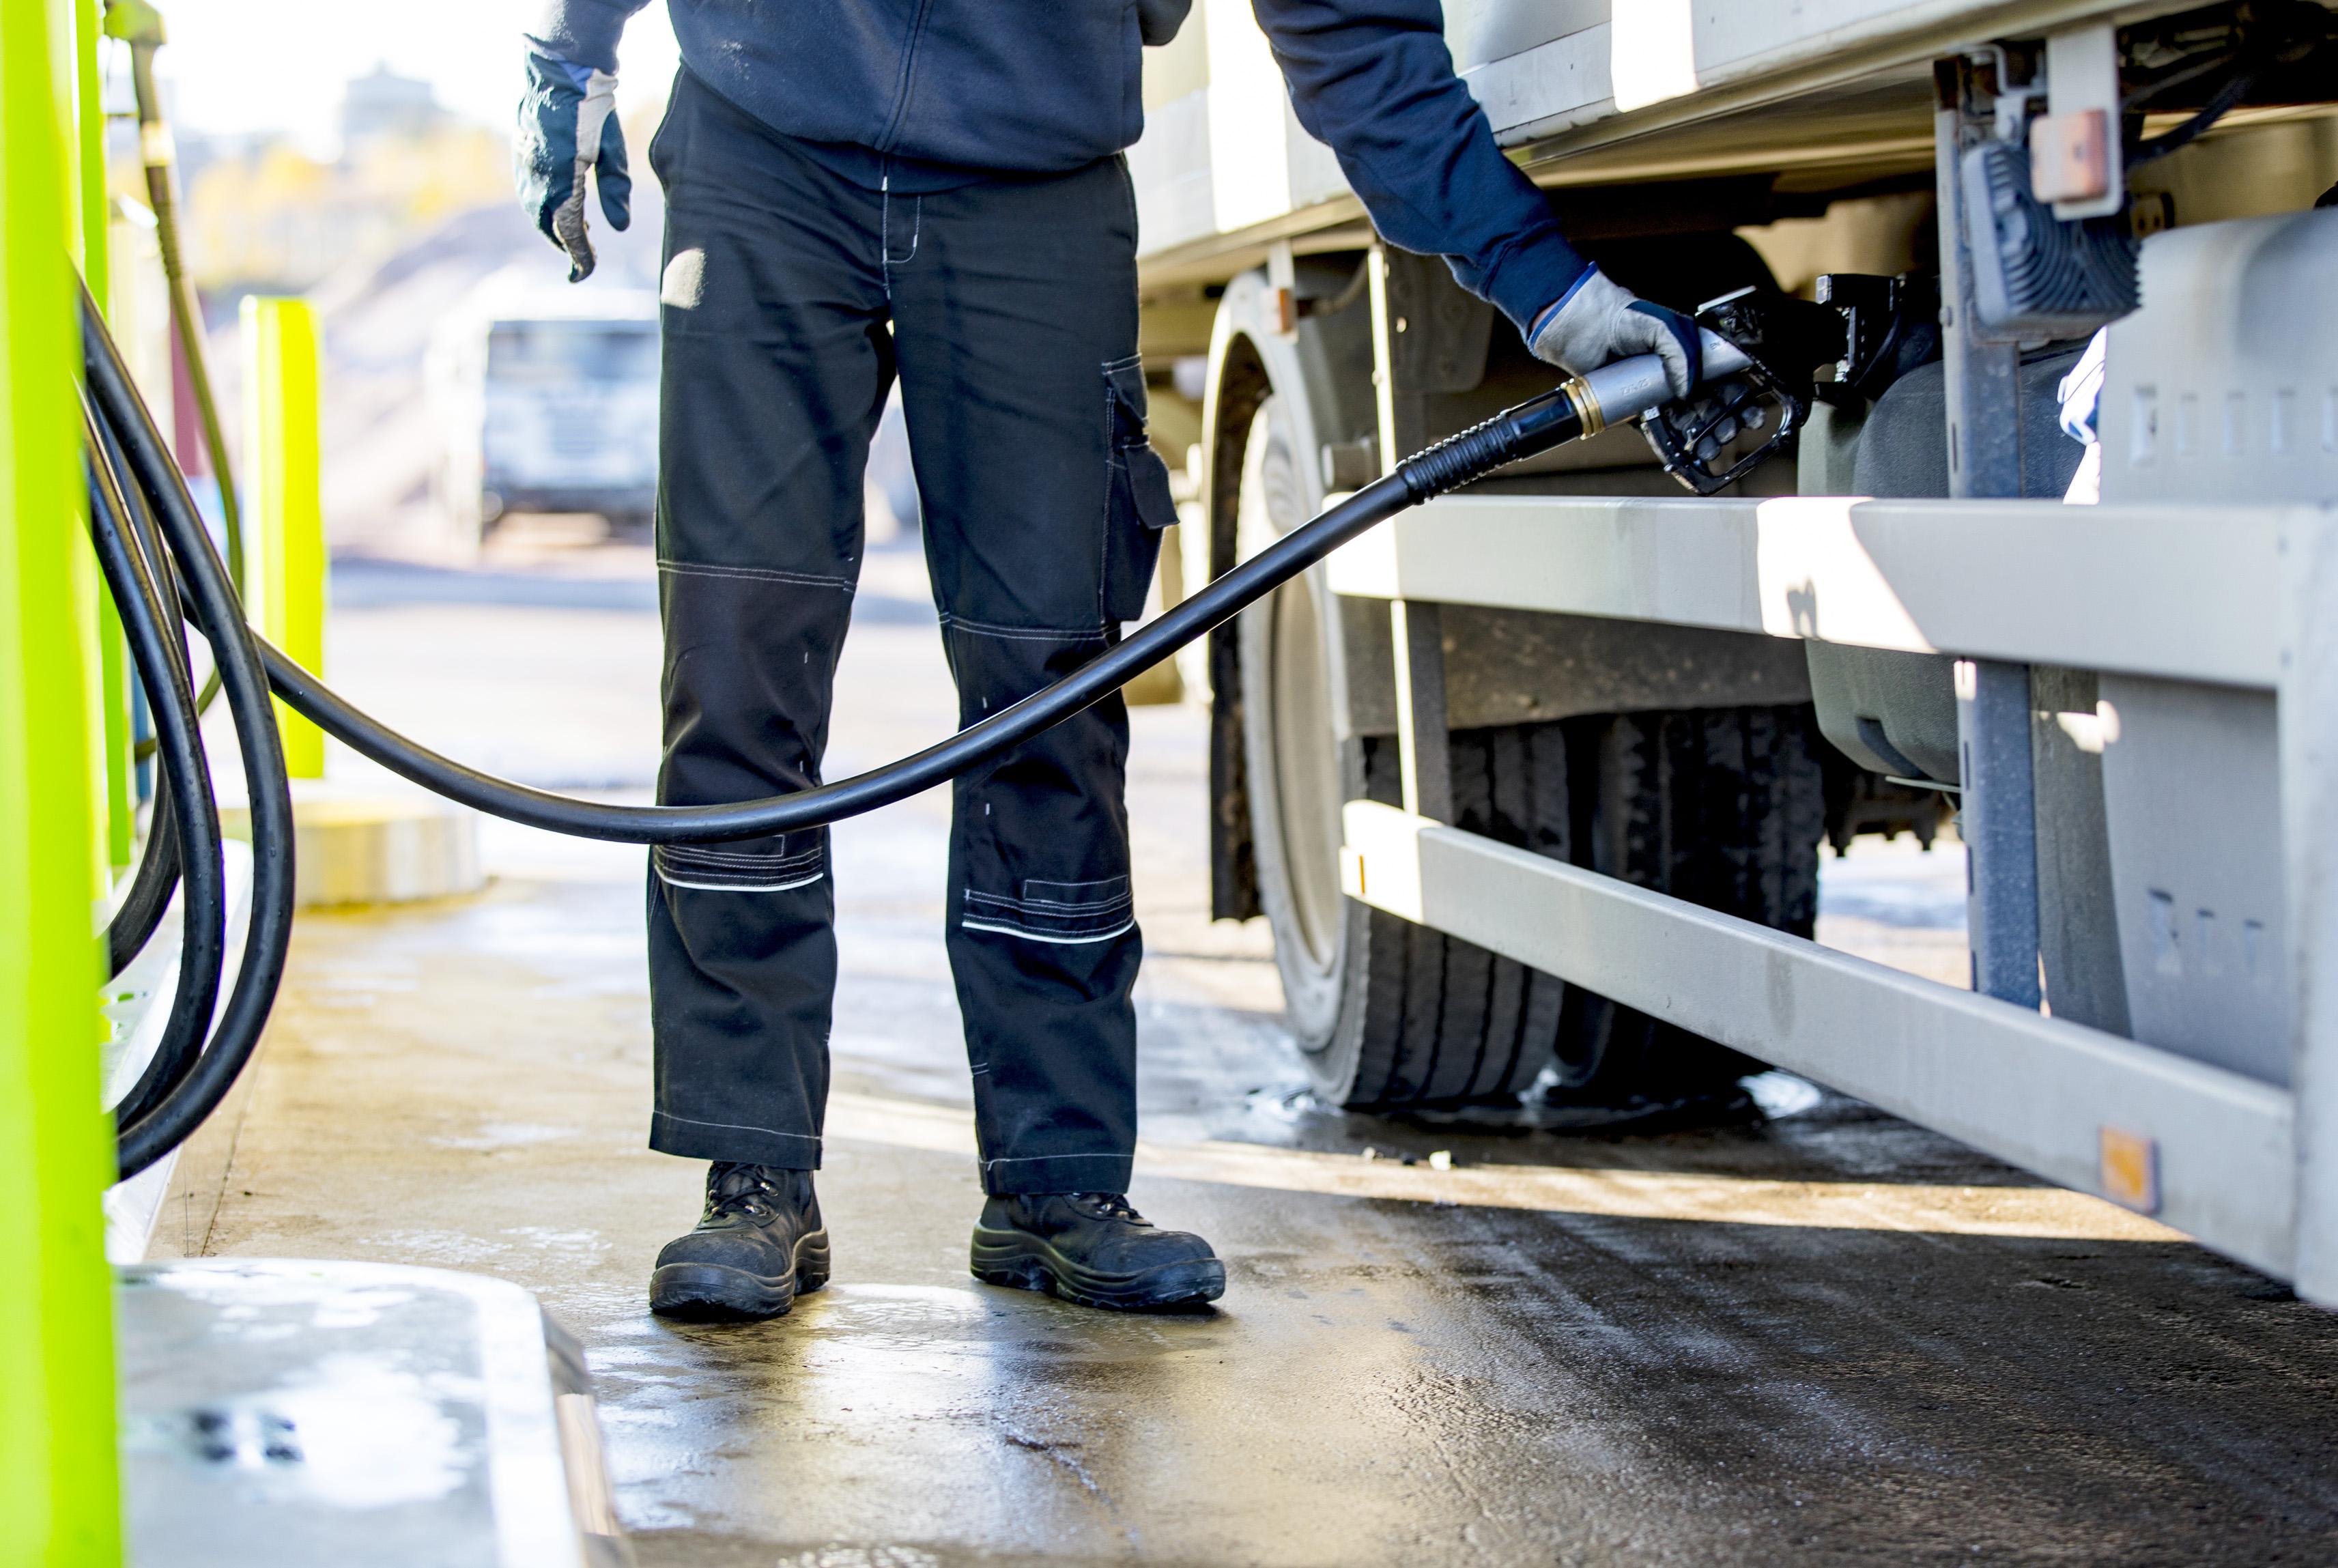 Get the Dirt on Diesel Contaminants